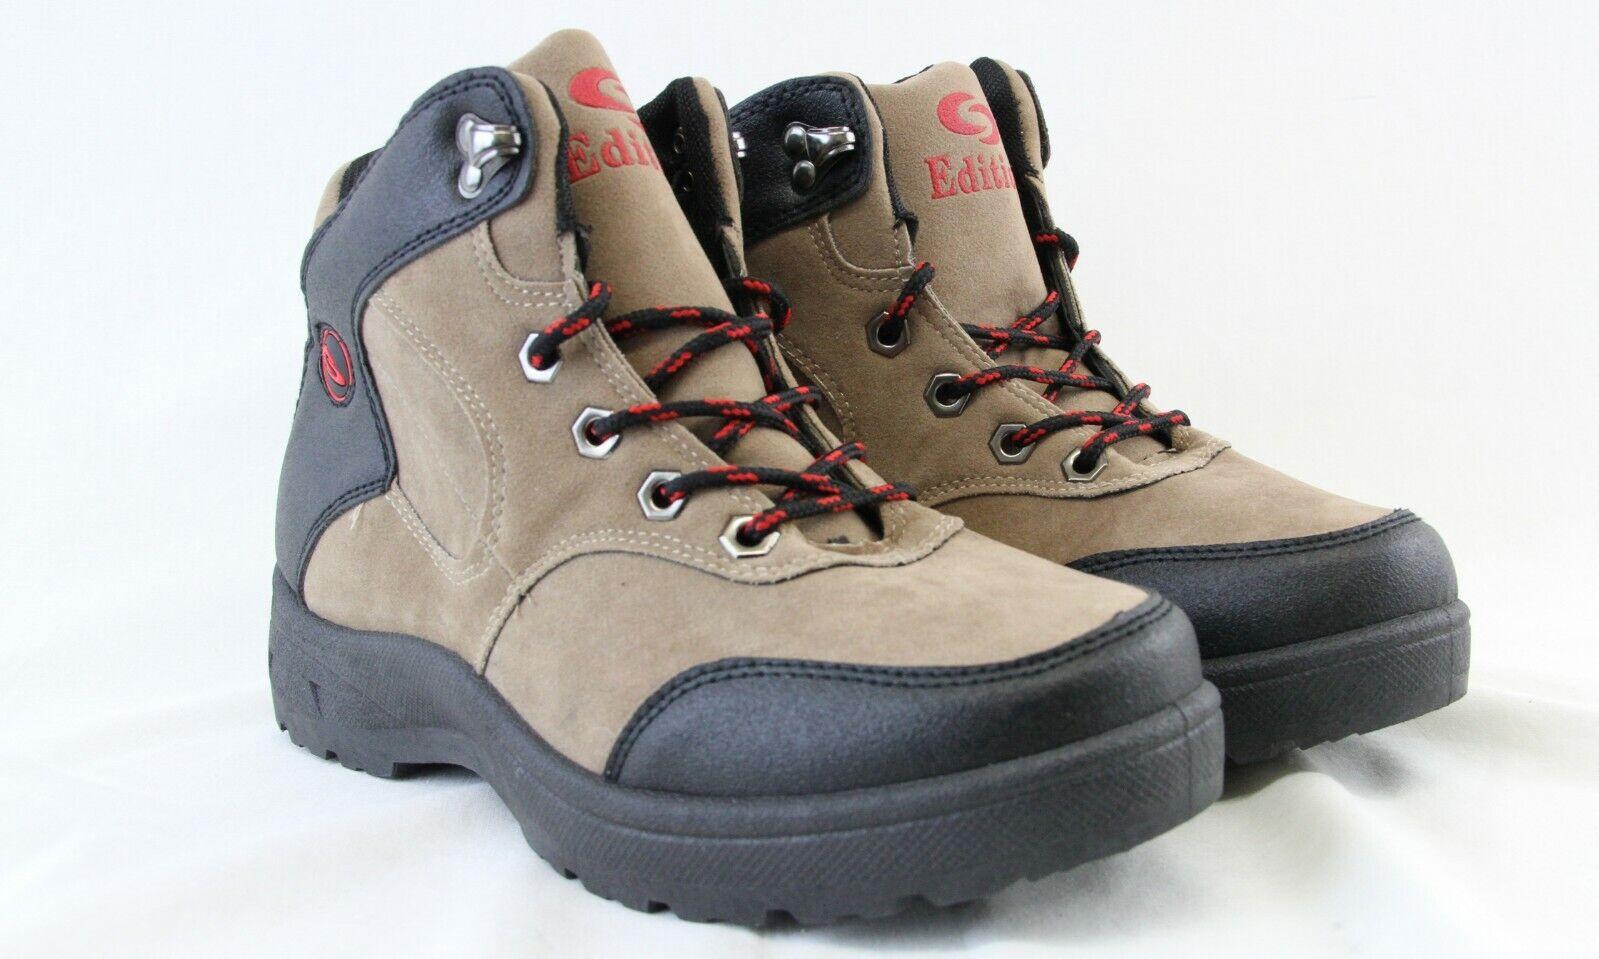 Men Lace Up Hiking Boots High Top Khaki Black Lightweight Walking Working Shoes